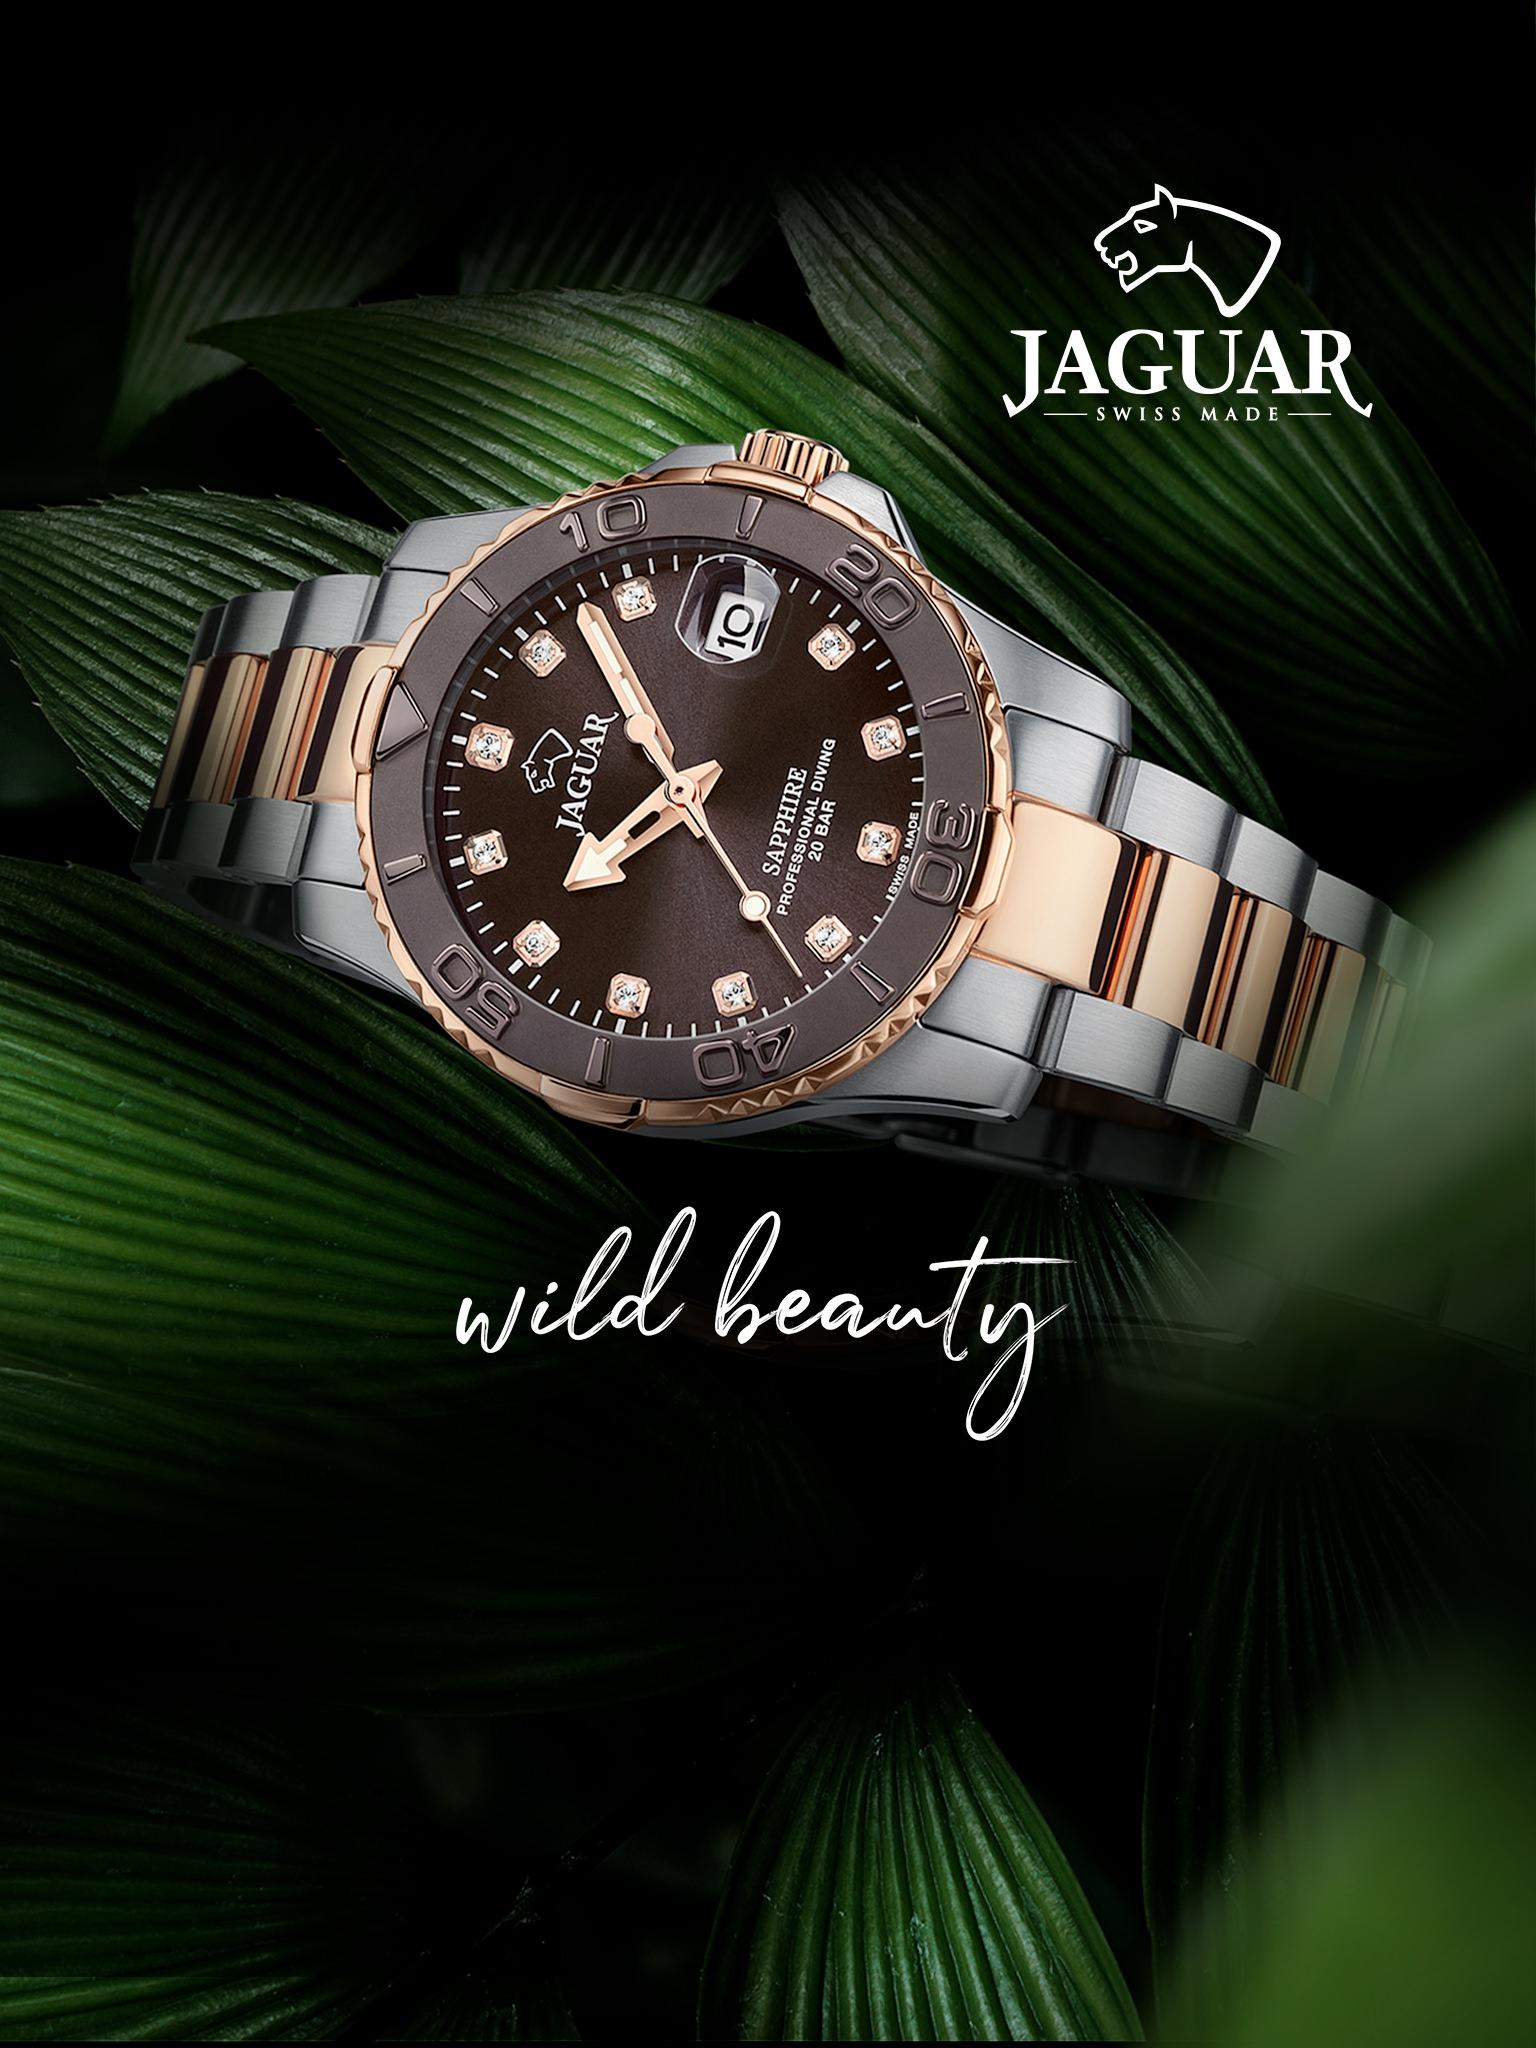 https://termekek.festina.hu/sites/default/files/revslider/image/jaguar-wild-beauty-2021-tablet.jpg